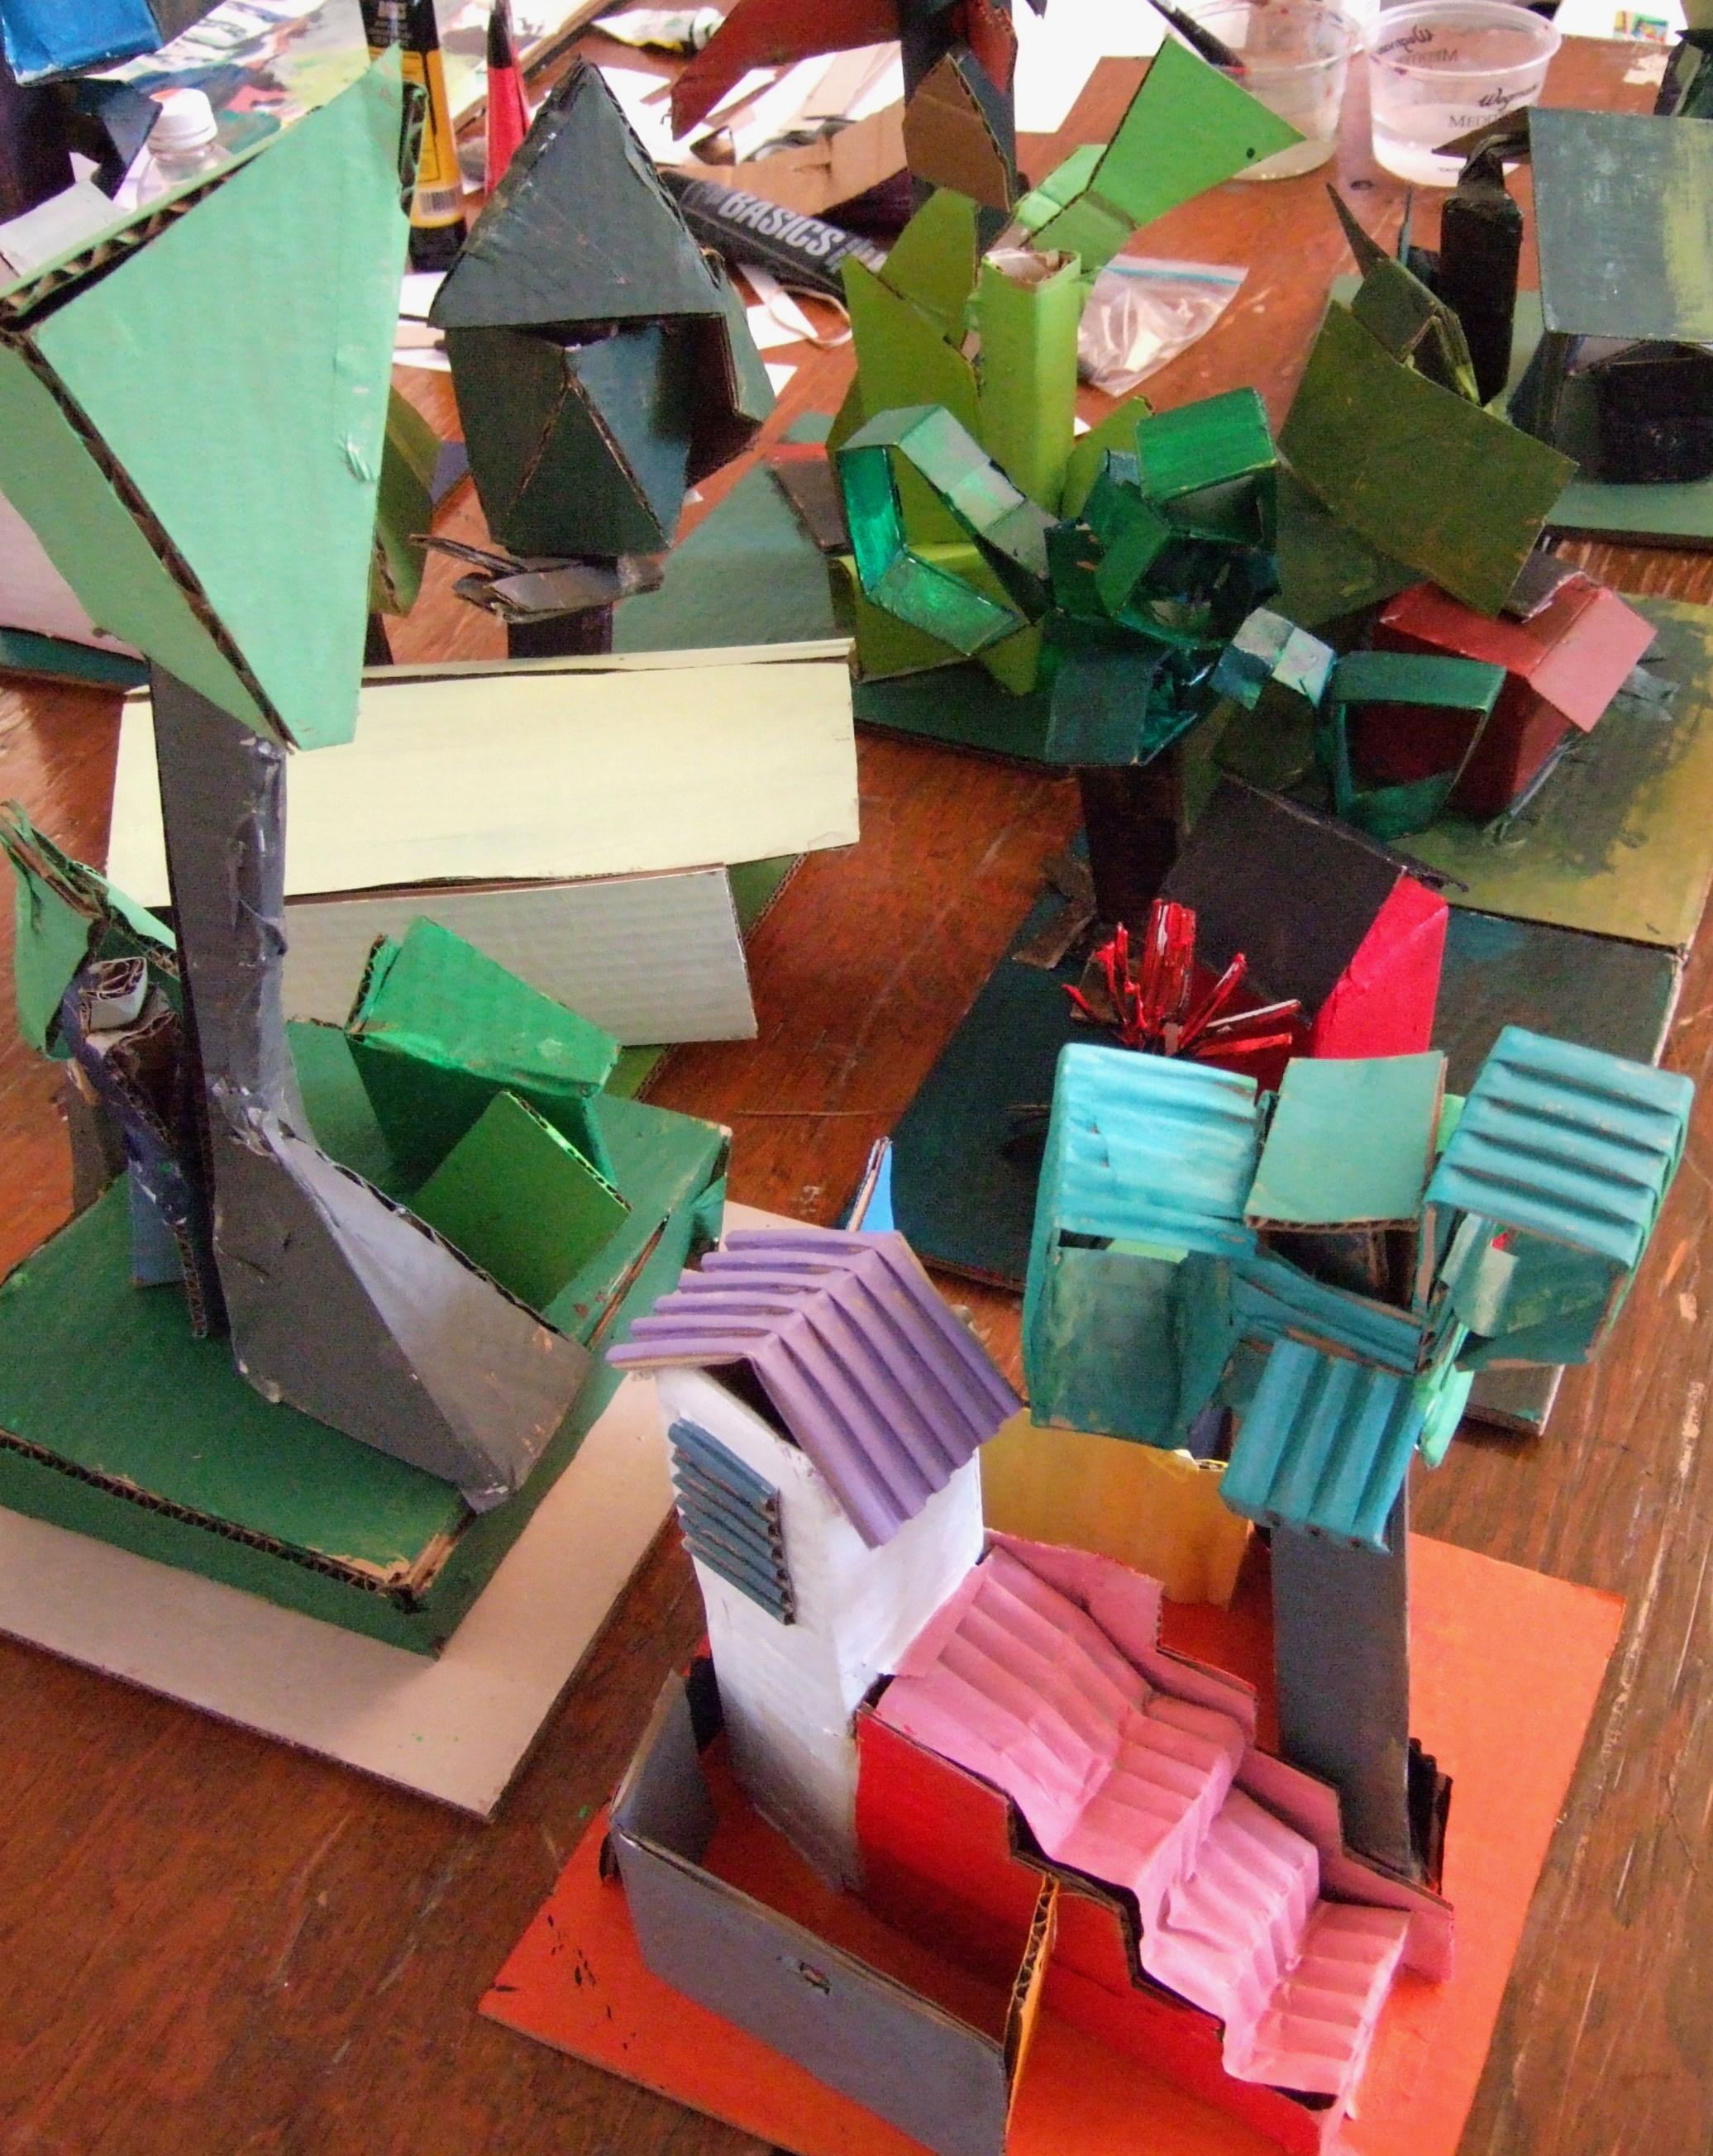 Putting the Cardboard Lancscapes Together